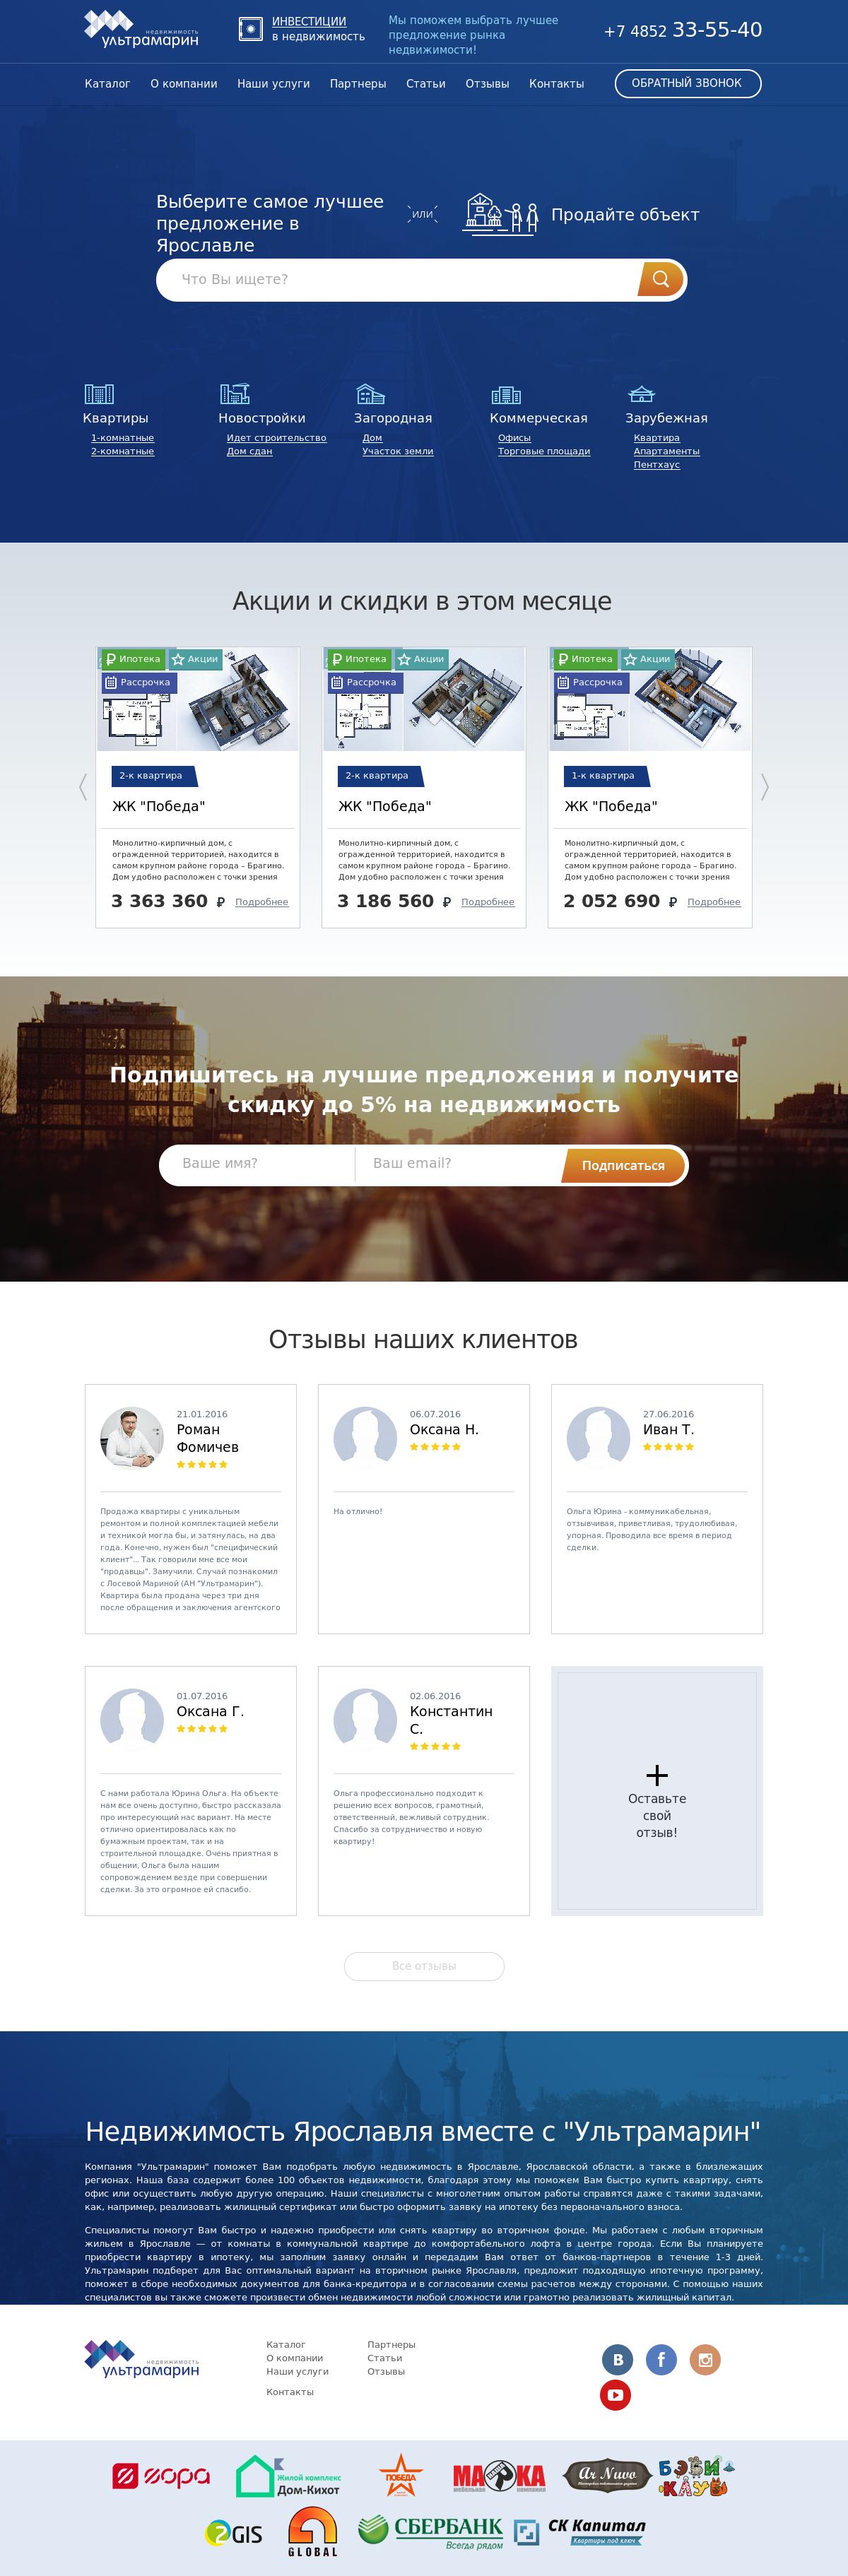 Ultra-house. Сервис поиска вторичной недвижимости в Ярославле.